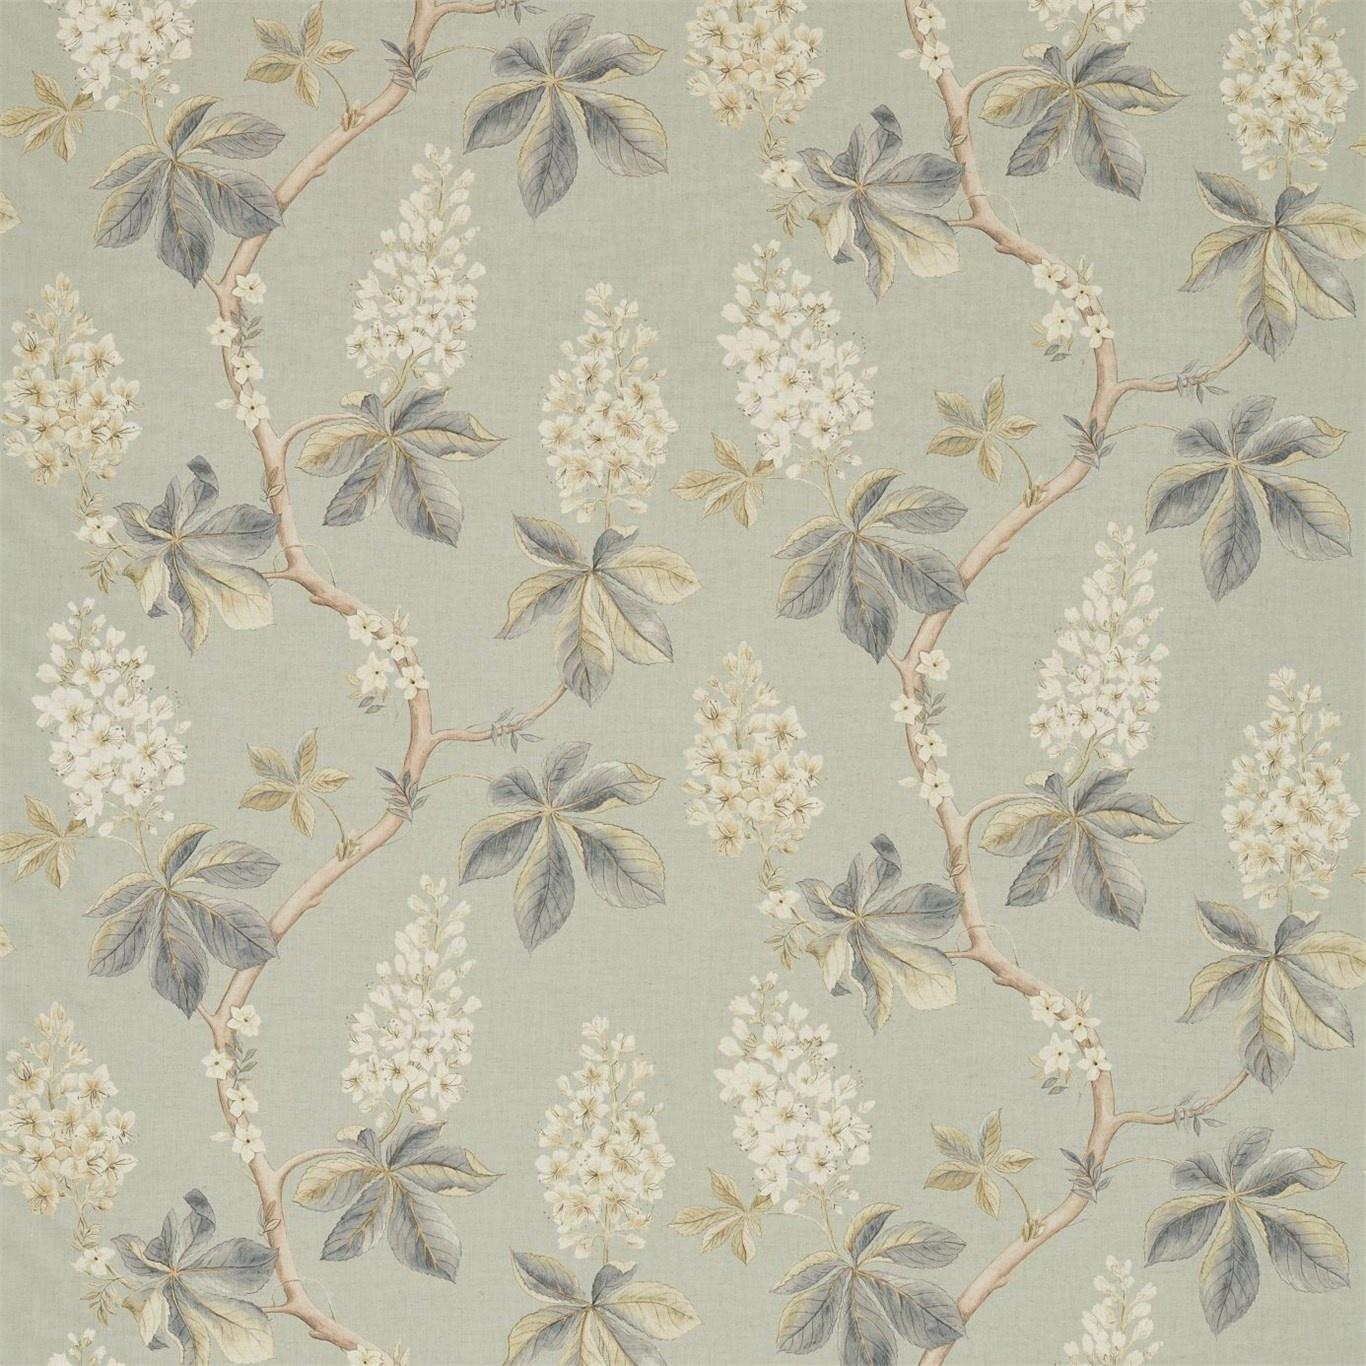 Image of Sanderson Chestnut Tree Grey Blue/Sage Fabric 225513